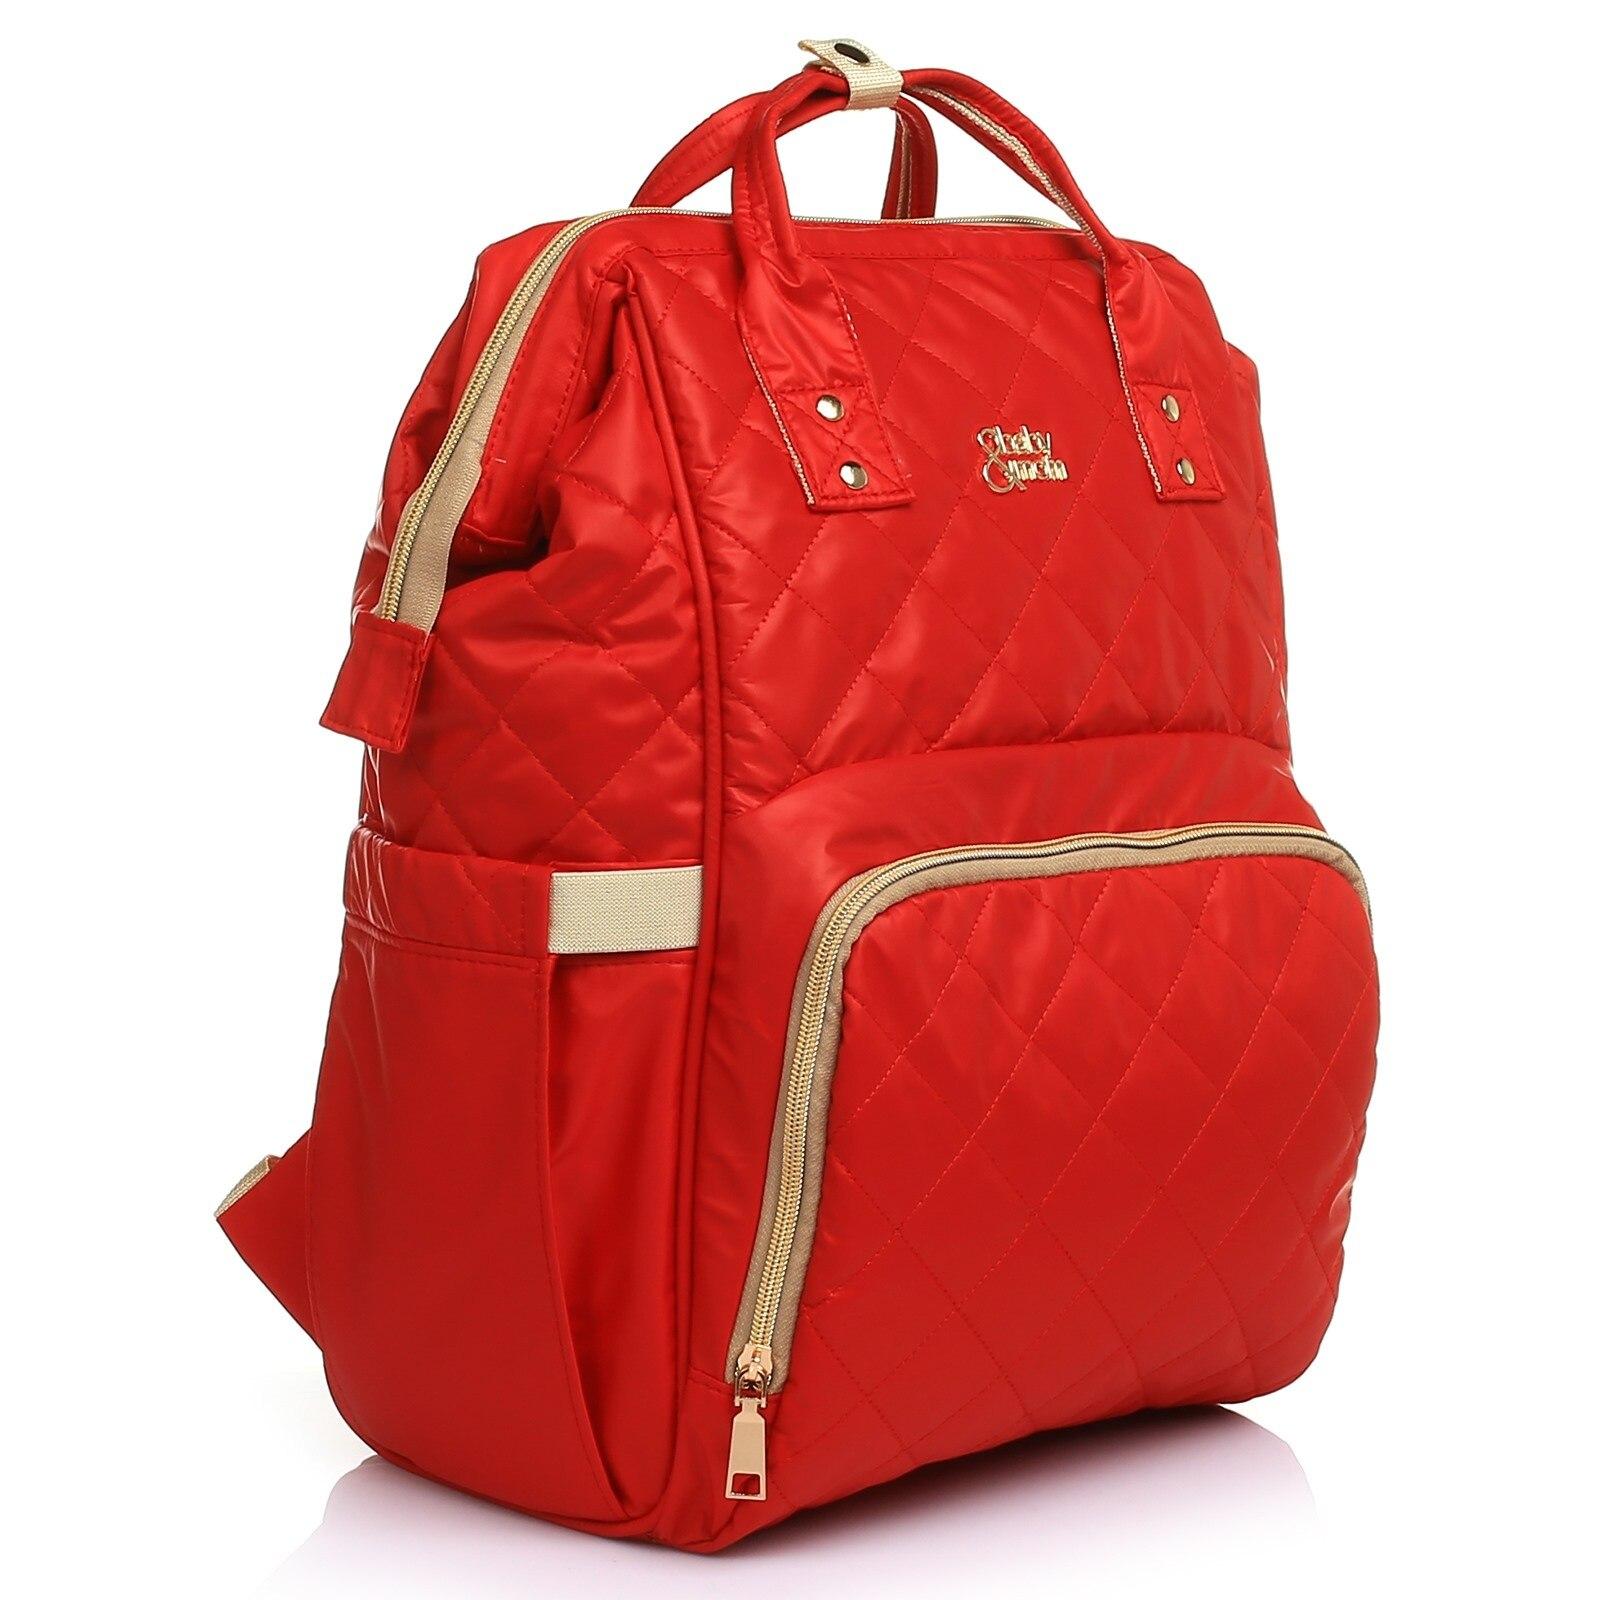 Ebebek Babymom Baby&Mom Travel Backpack